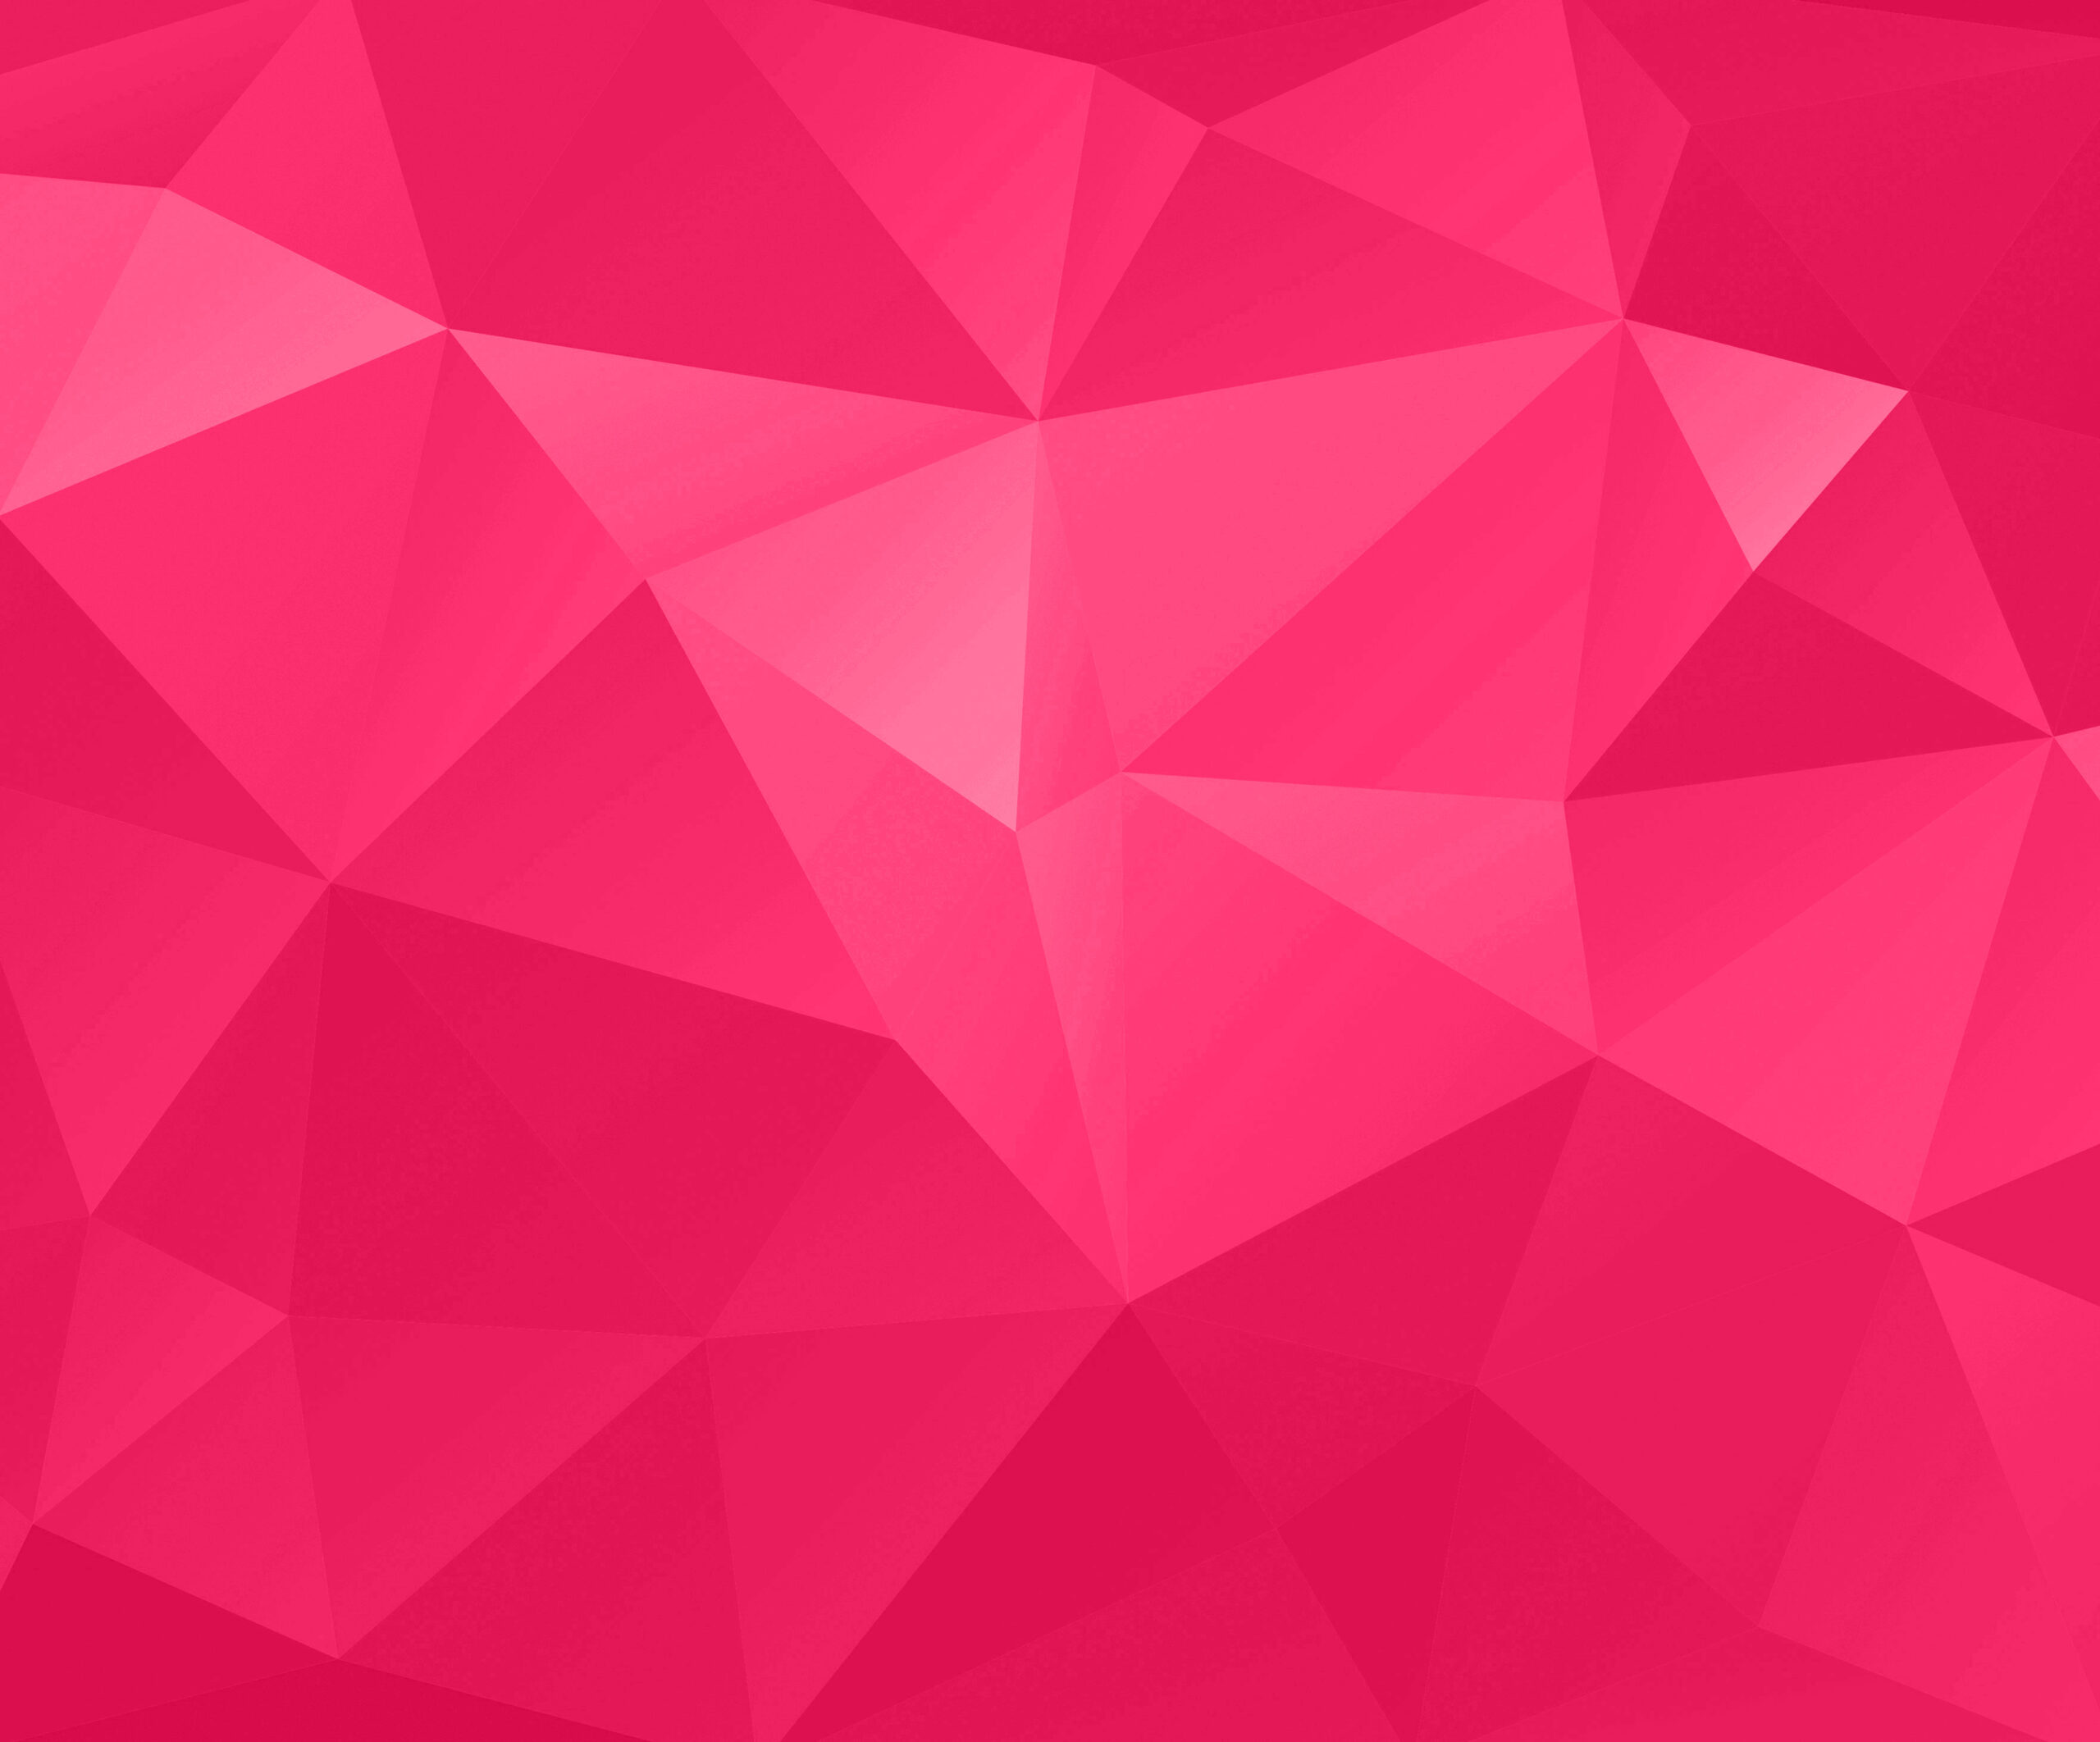 rose_prismtexture